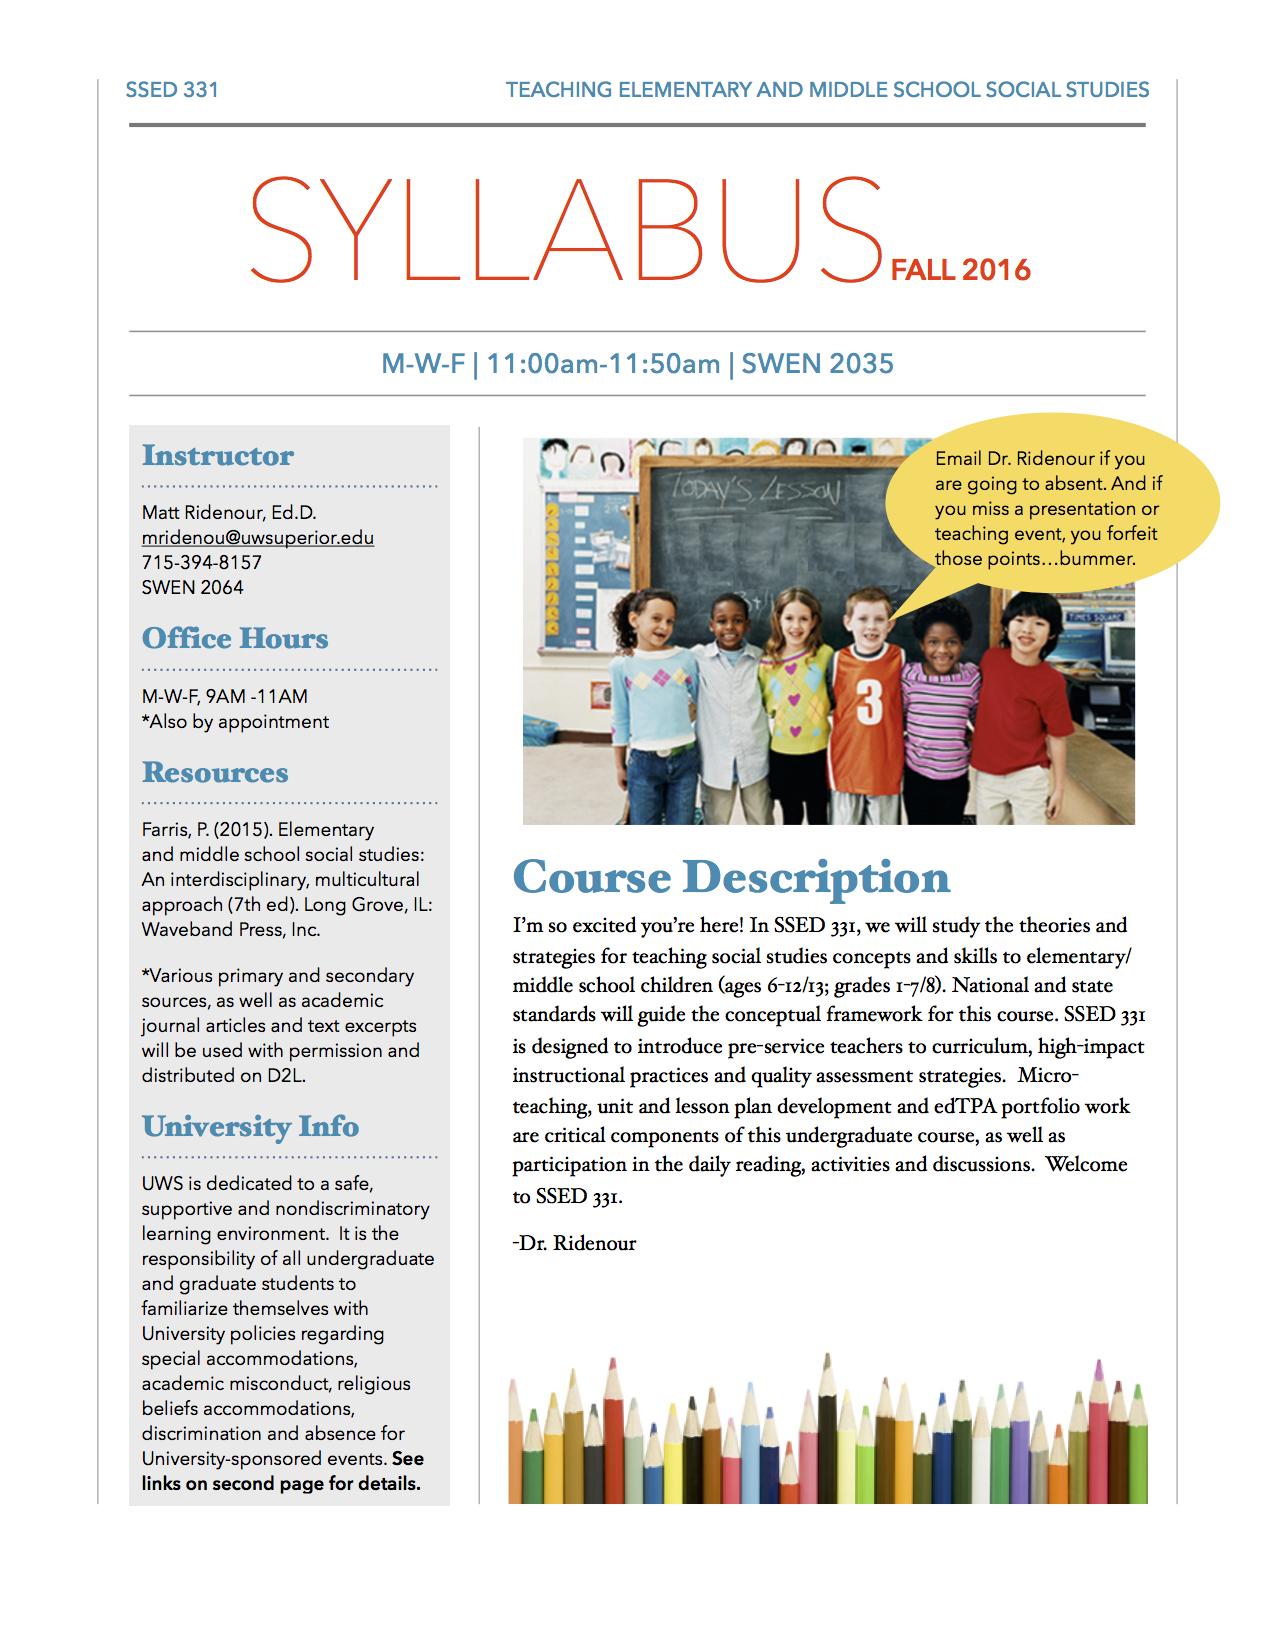 SSED 331 Fall 2016 Syllabus 7:27 Draft (dragged).jpg